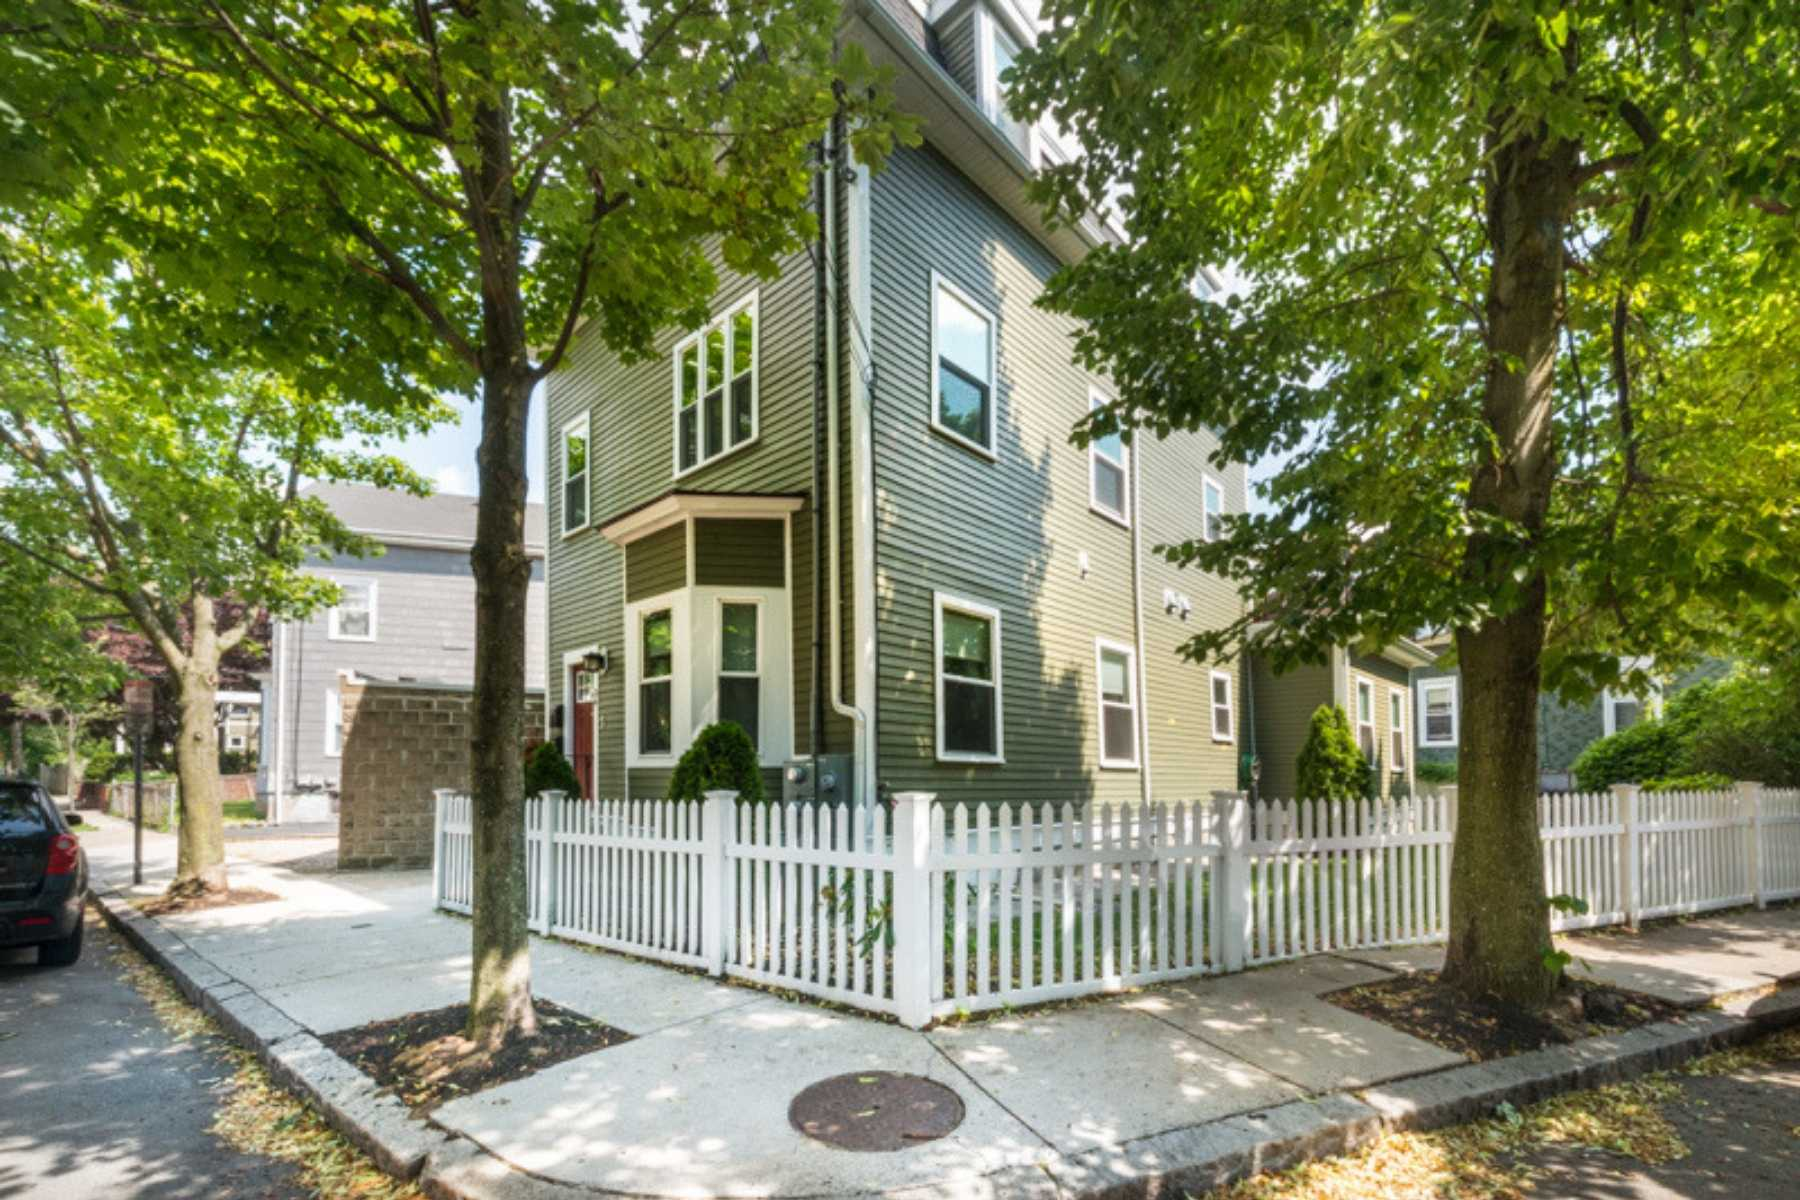 2-CapstoneCommunities-property-OakStreetCondominiums-Somerville.jpg